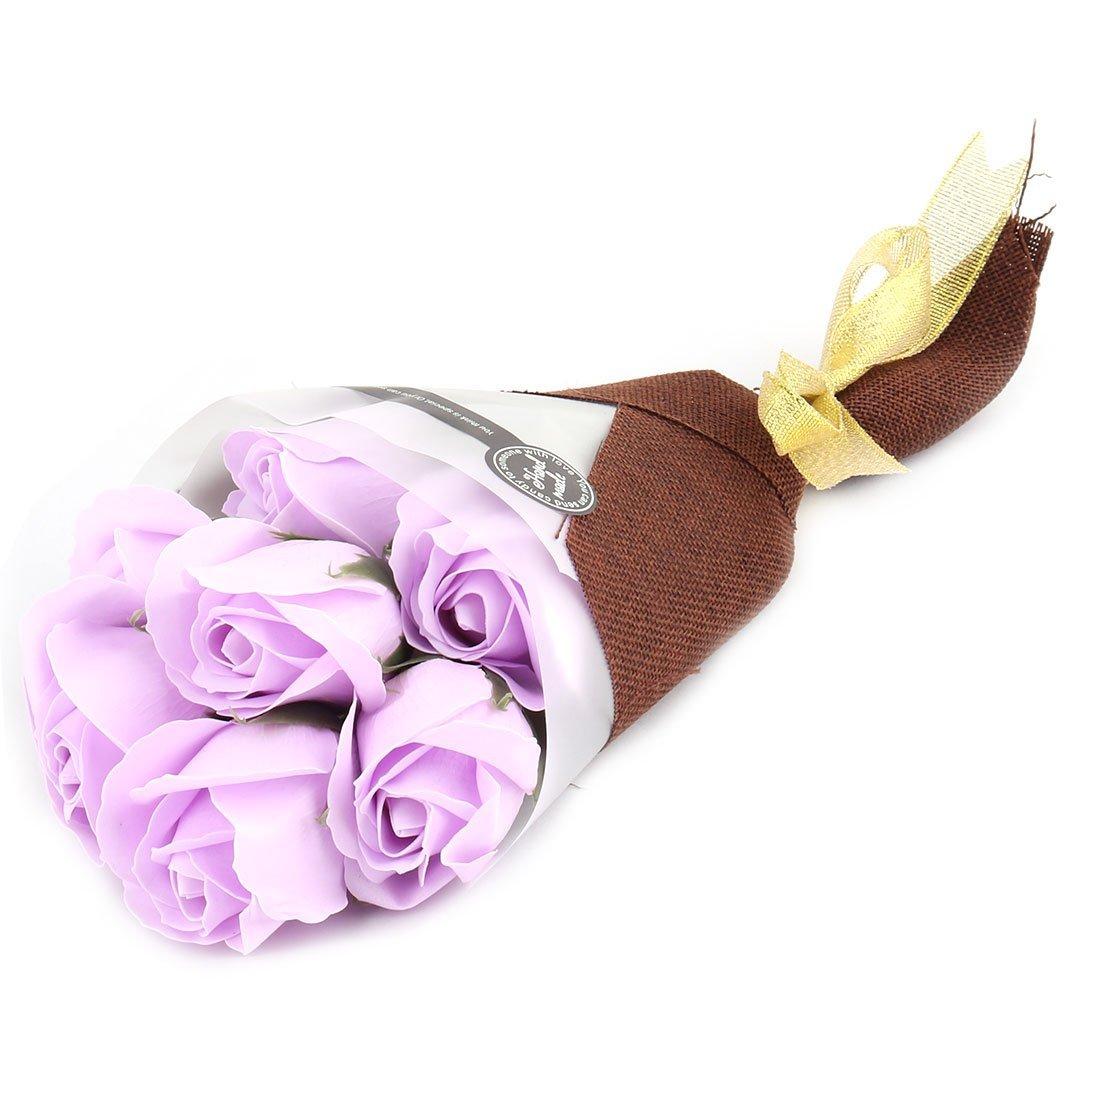 Amazon.com: eDealMax Regalo de cumpleaños artificiales de Rose Floral de Lavado de baño de jabón ramo de Flores púrpura de luz 7pcs: Home & Kitchen